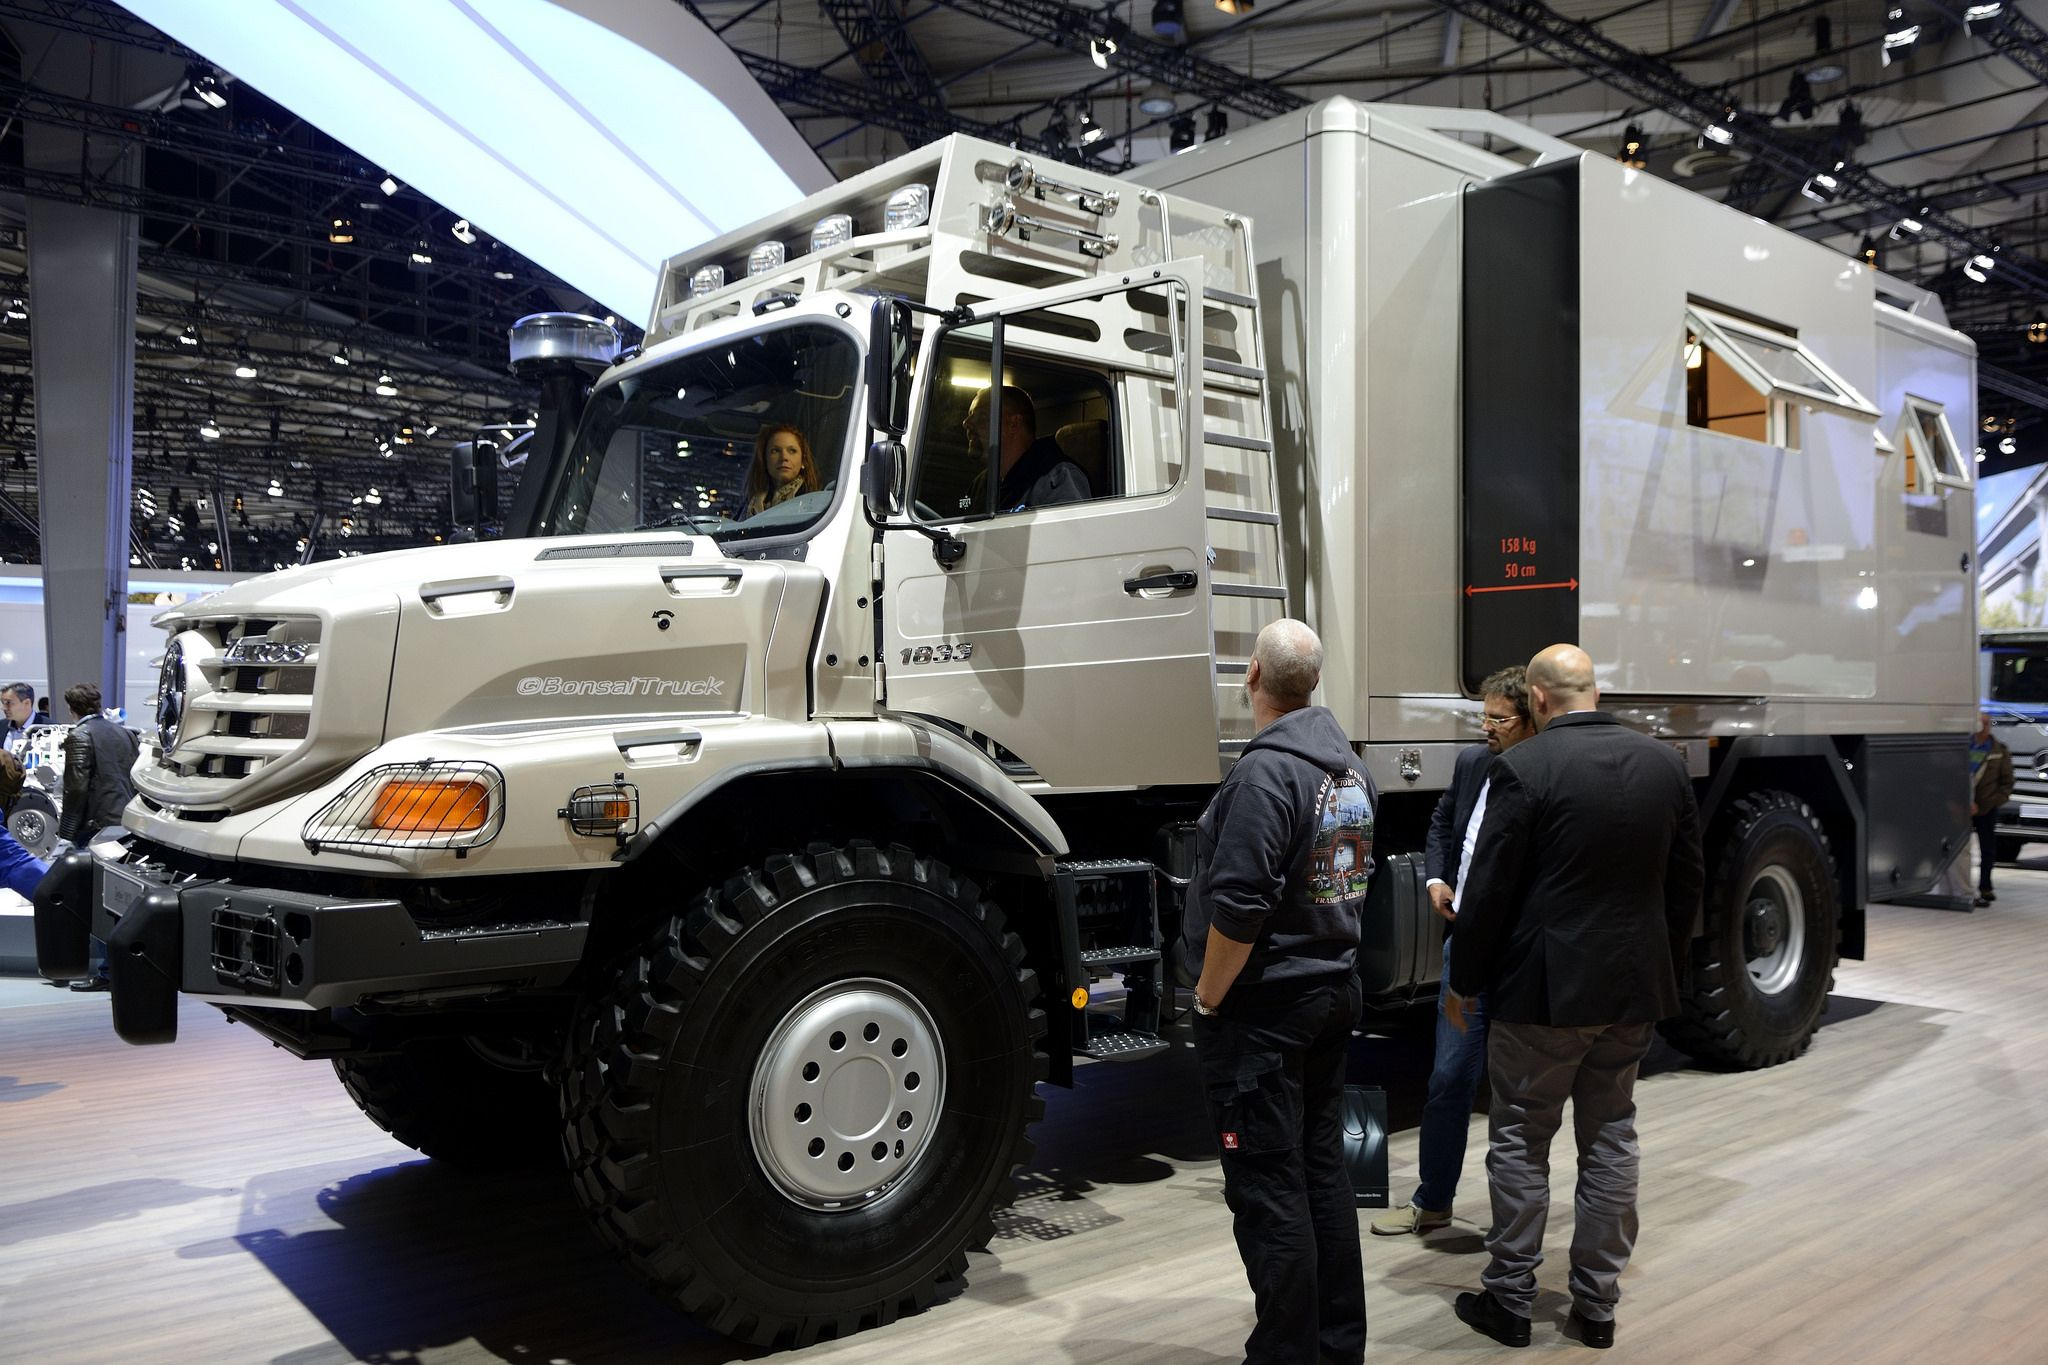 Image gallery mercedes benz zetros for Mercedes benz zetros 6x6 expedition vehicle